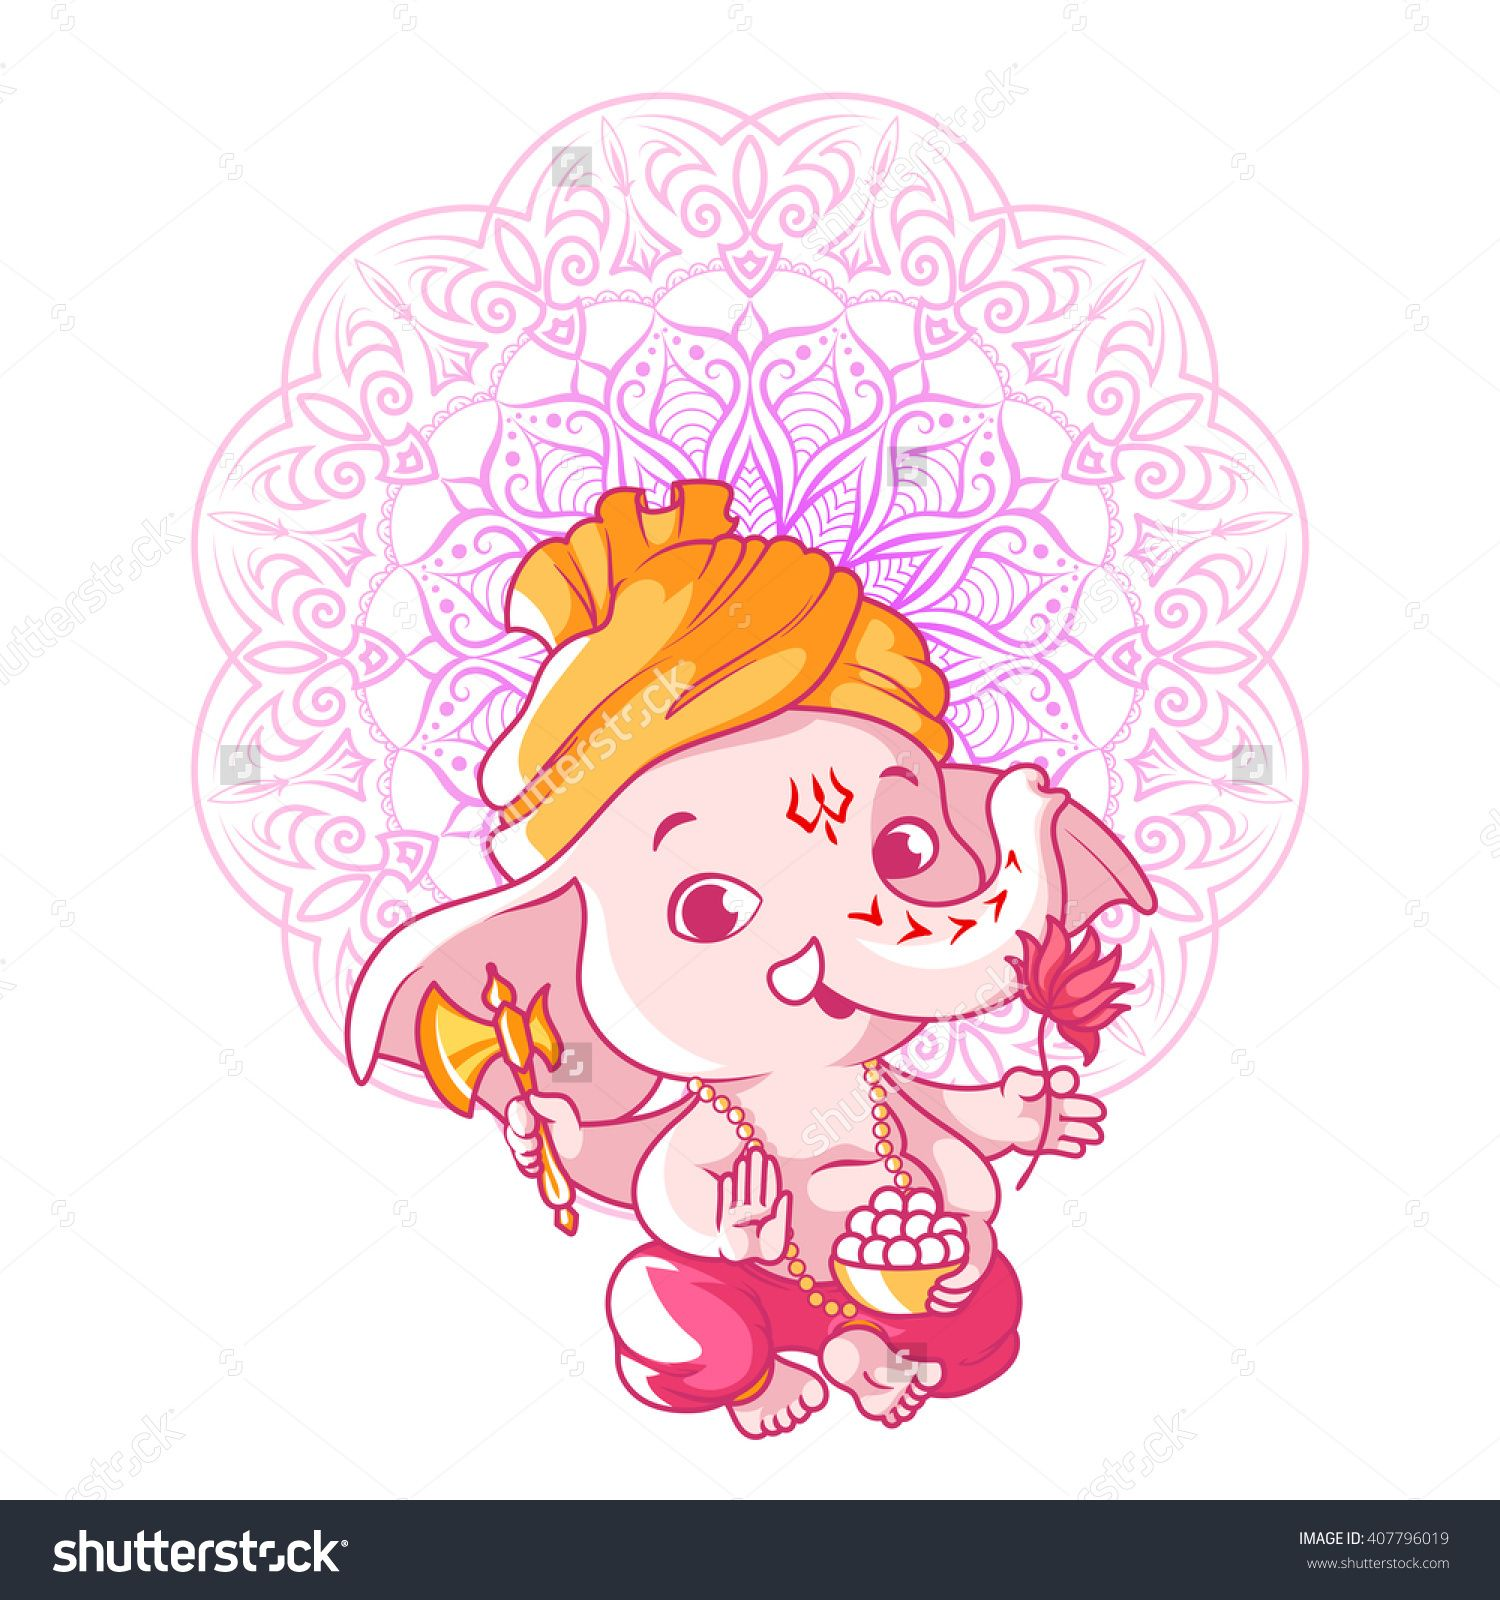 Little Cute Ganesha Cartoon Character Vector Cartoon Illustration On A White Background 407796019 Shutt God Illustrations Ganesha Art Mandala Design Art